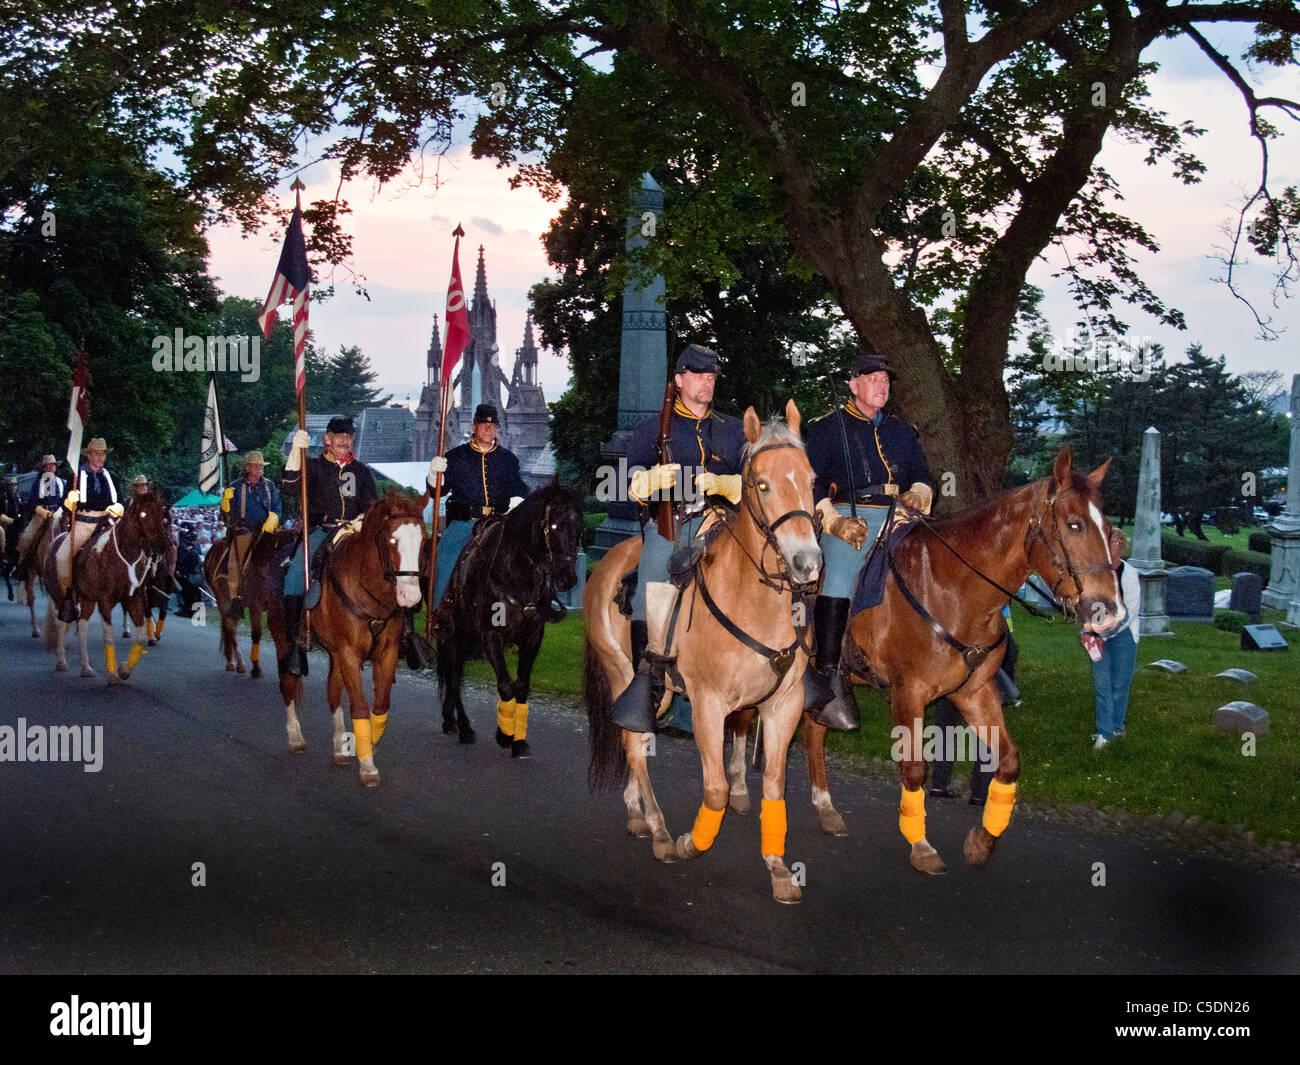 Riding horses, Civil War reenactors wearing period uniform meet on Memorial Day in Green-Wood Cemetery in Brooklyn, - Stock Image